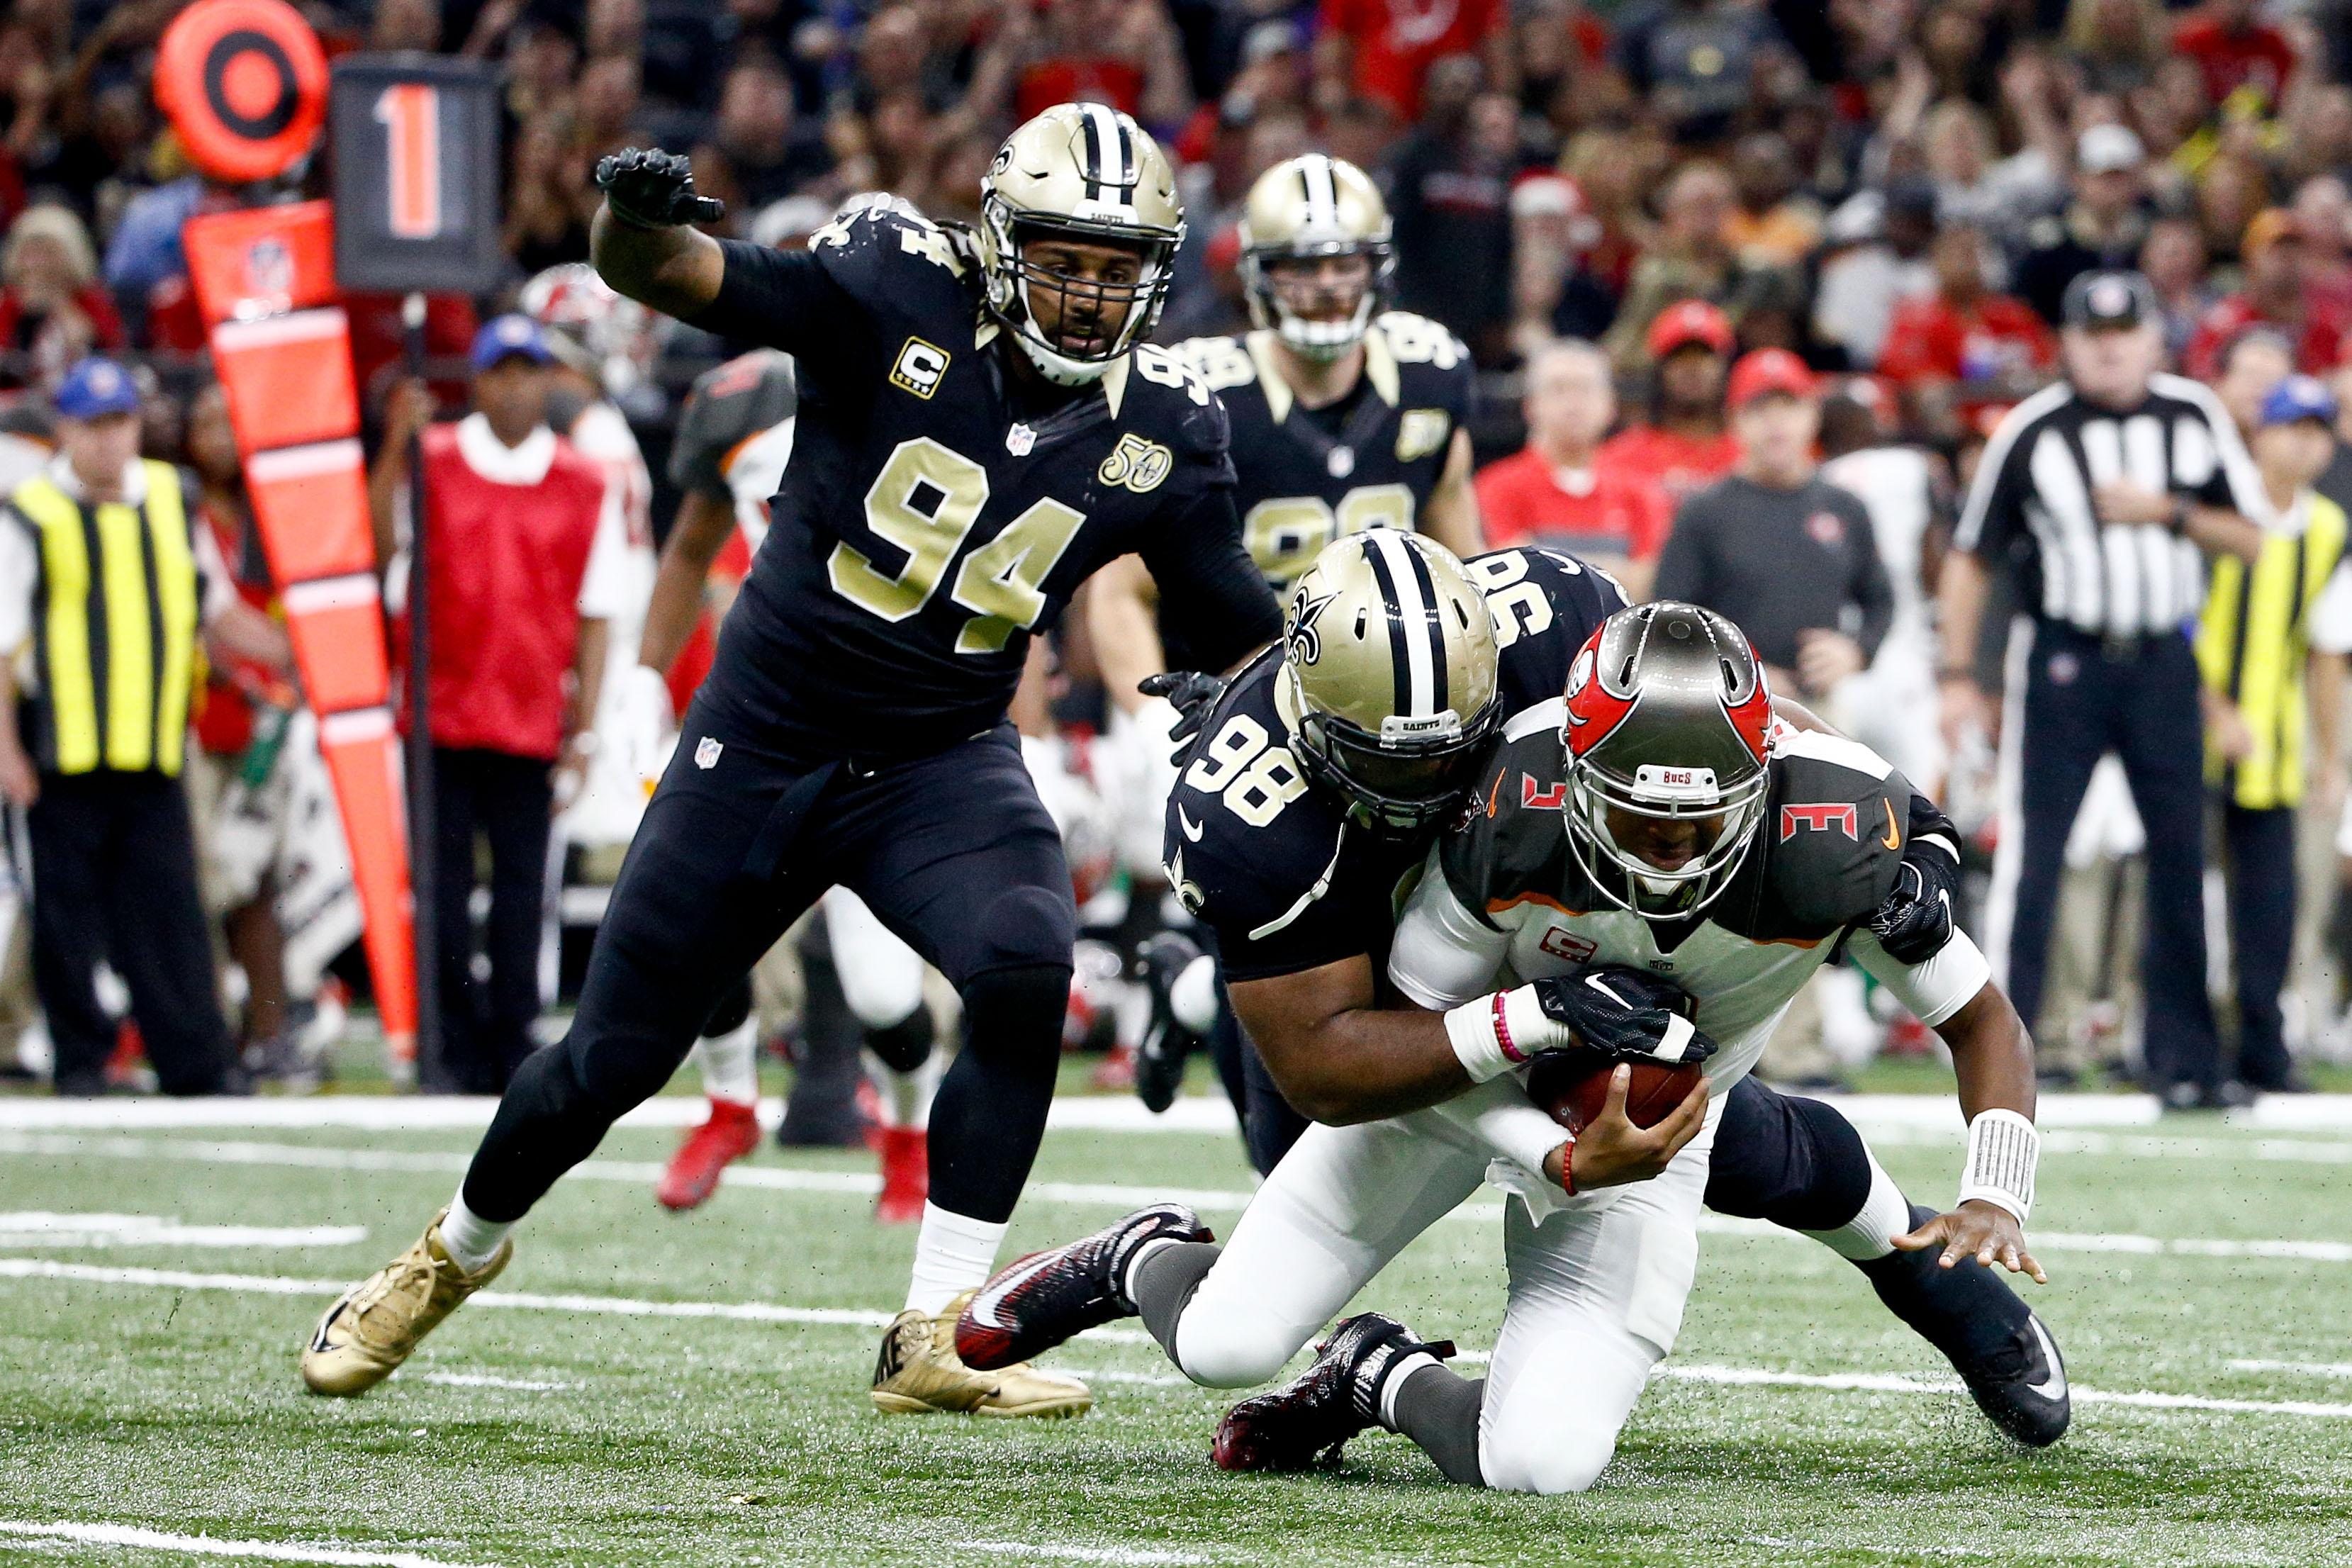 New Orleans Saints Sheldon Rankins Could Be Secret Weapon Ta Bay Buccaneers Adam Gaine